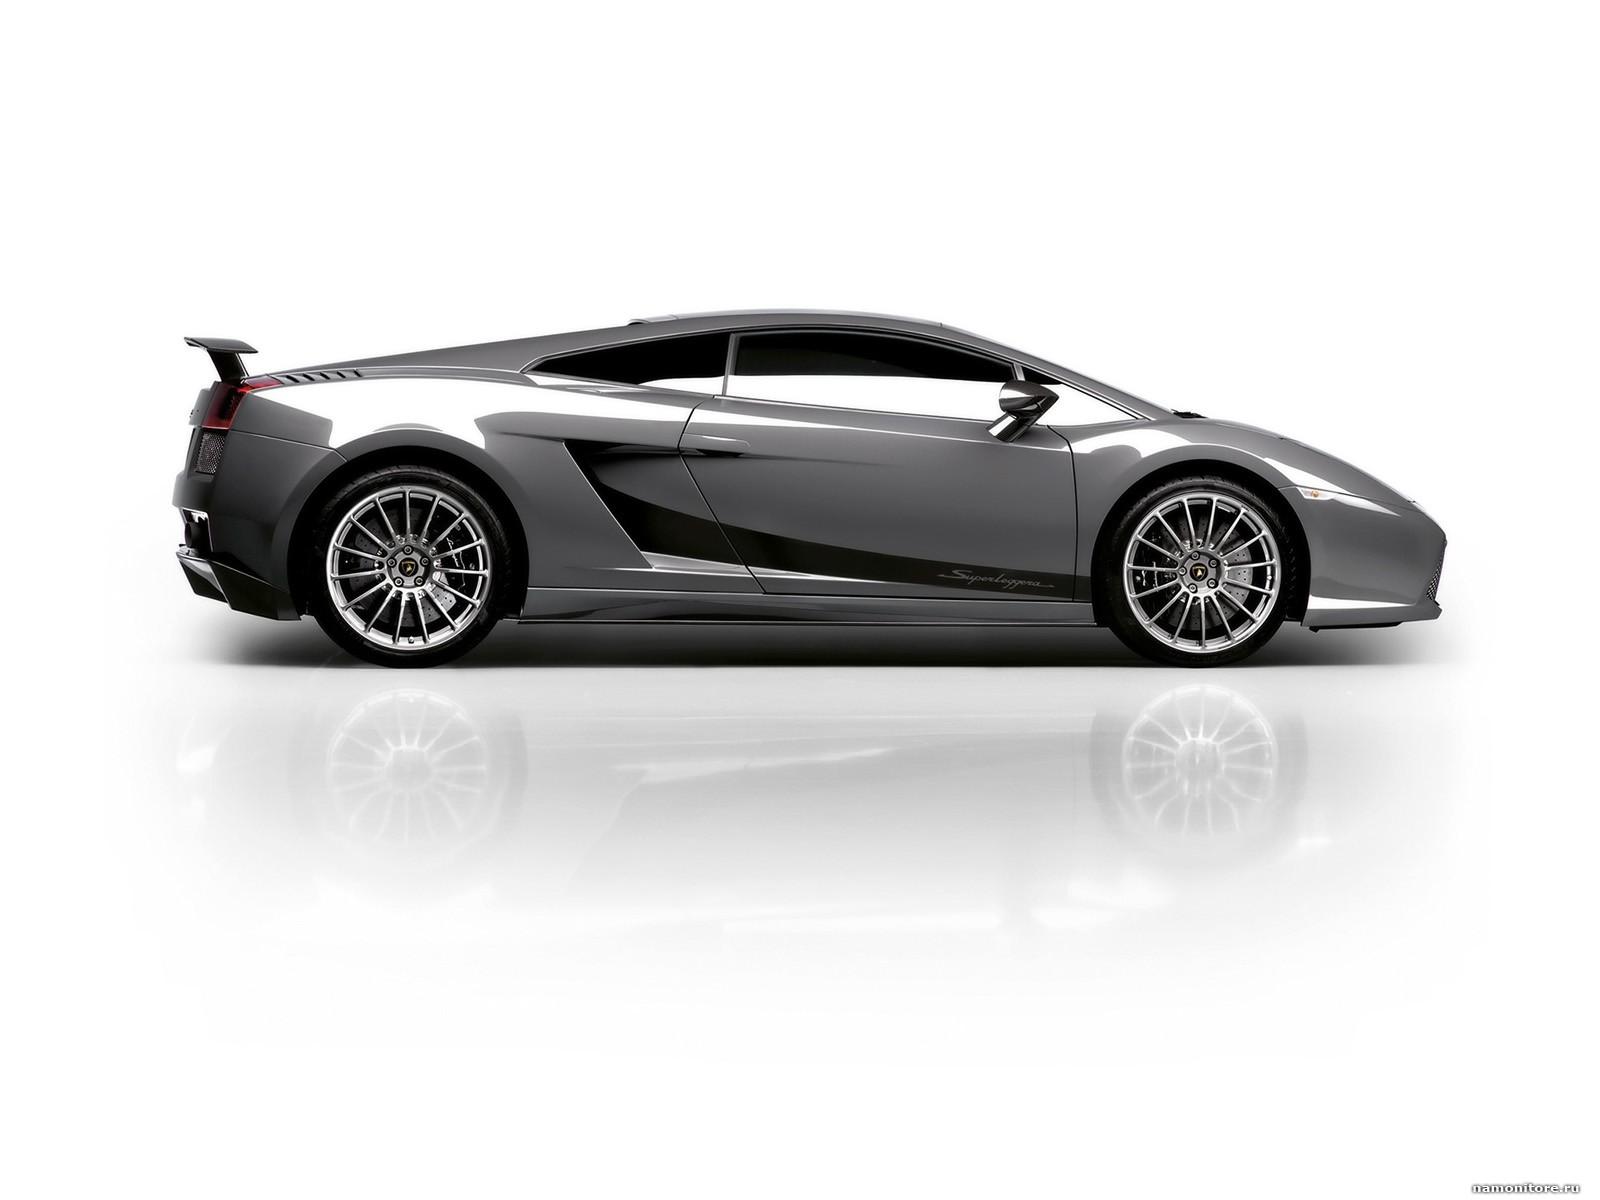 Lamborghini clipart #14